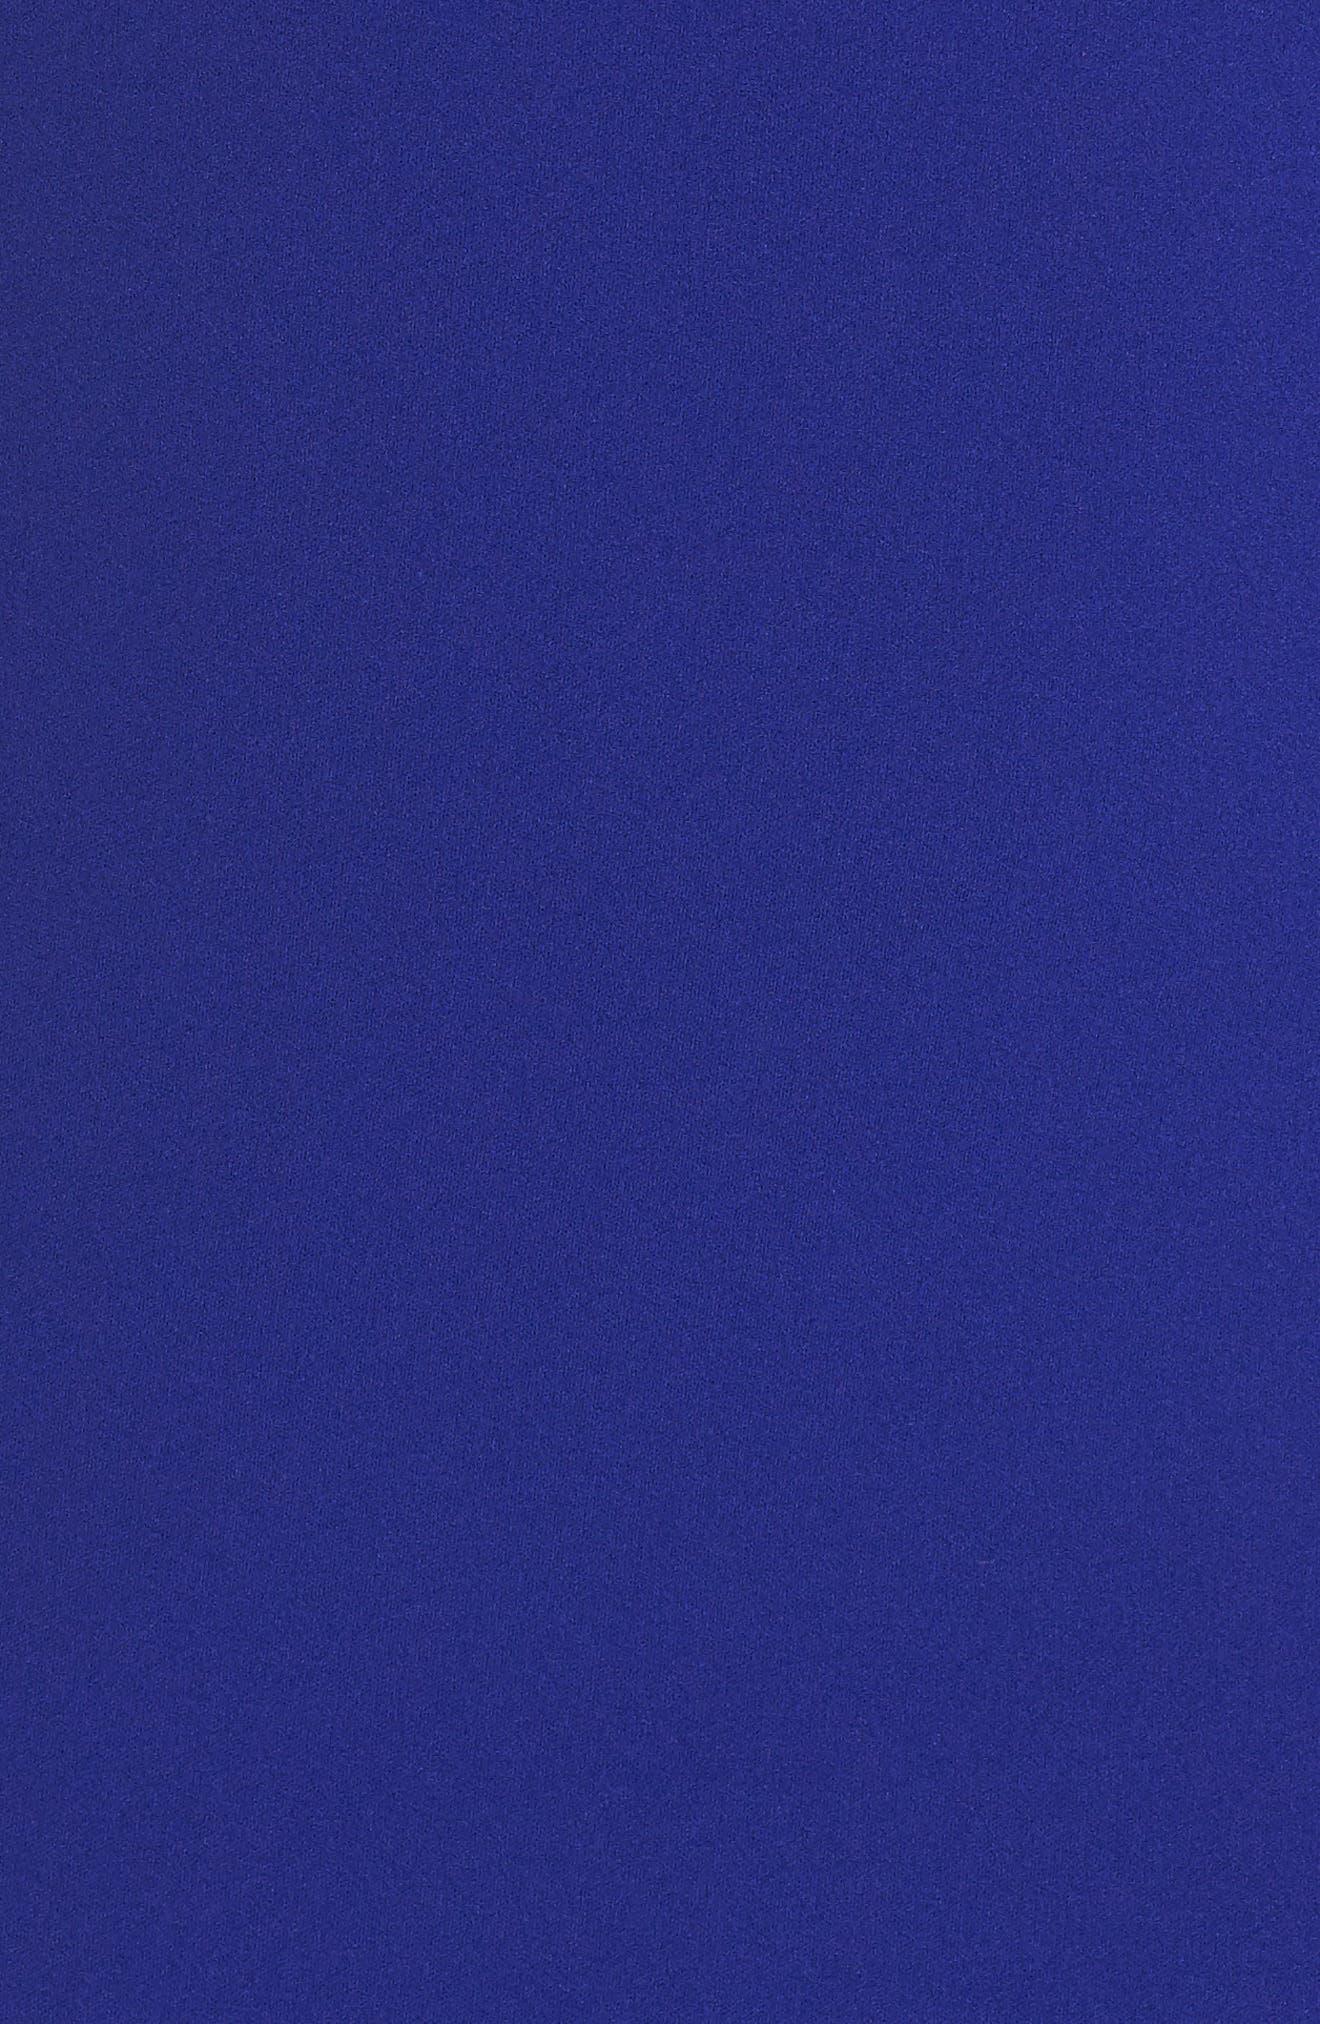 Ruffle Hem Scuba Crepe Body-Con Dress,                             Alternate thumbnail 6, color,                             Cobalt